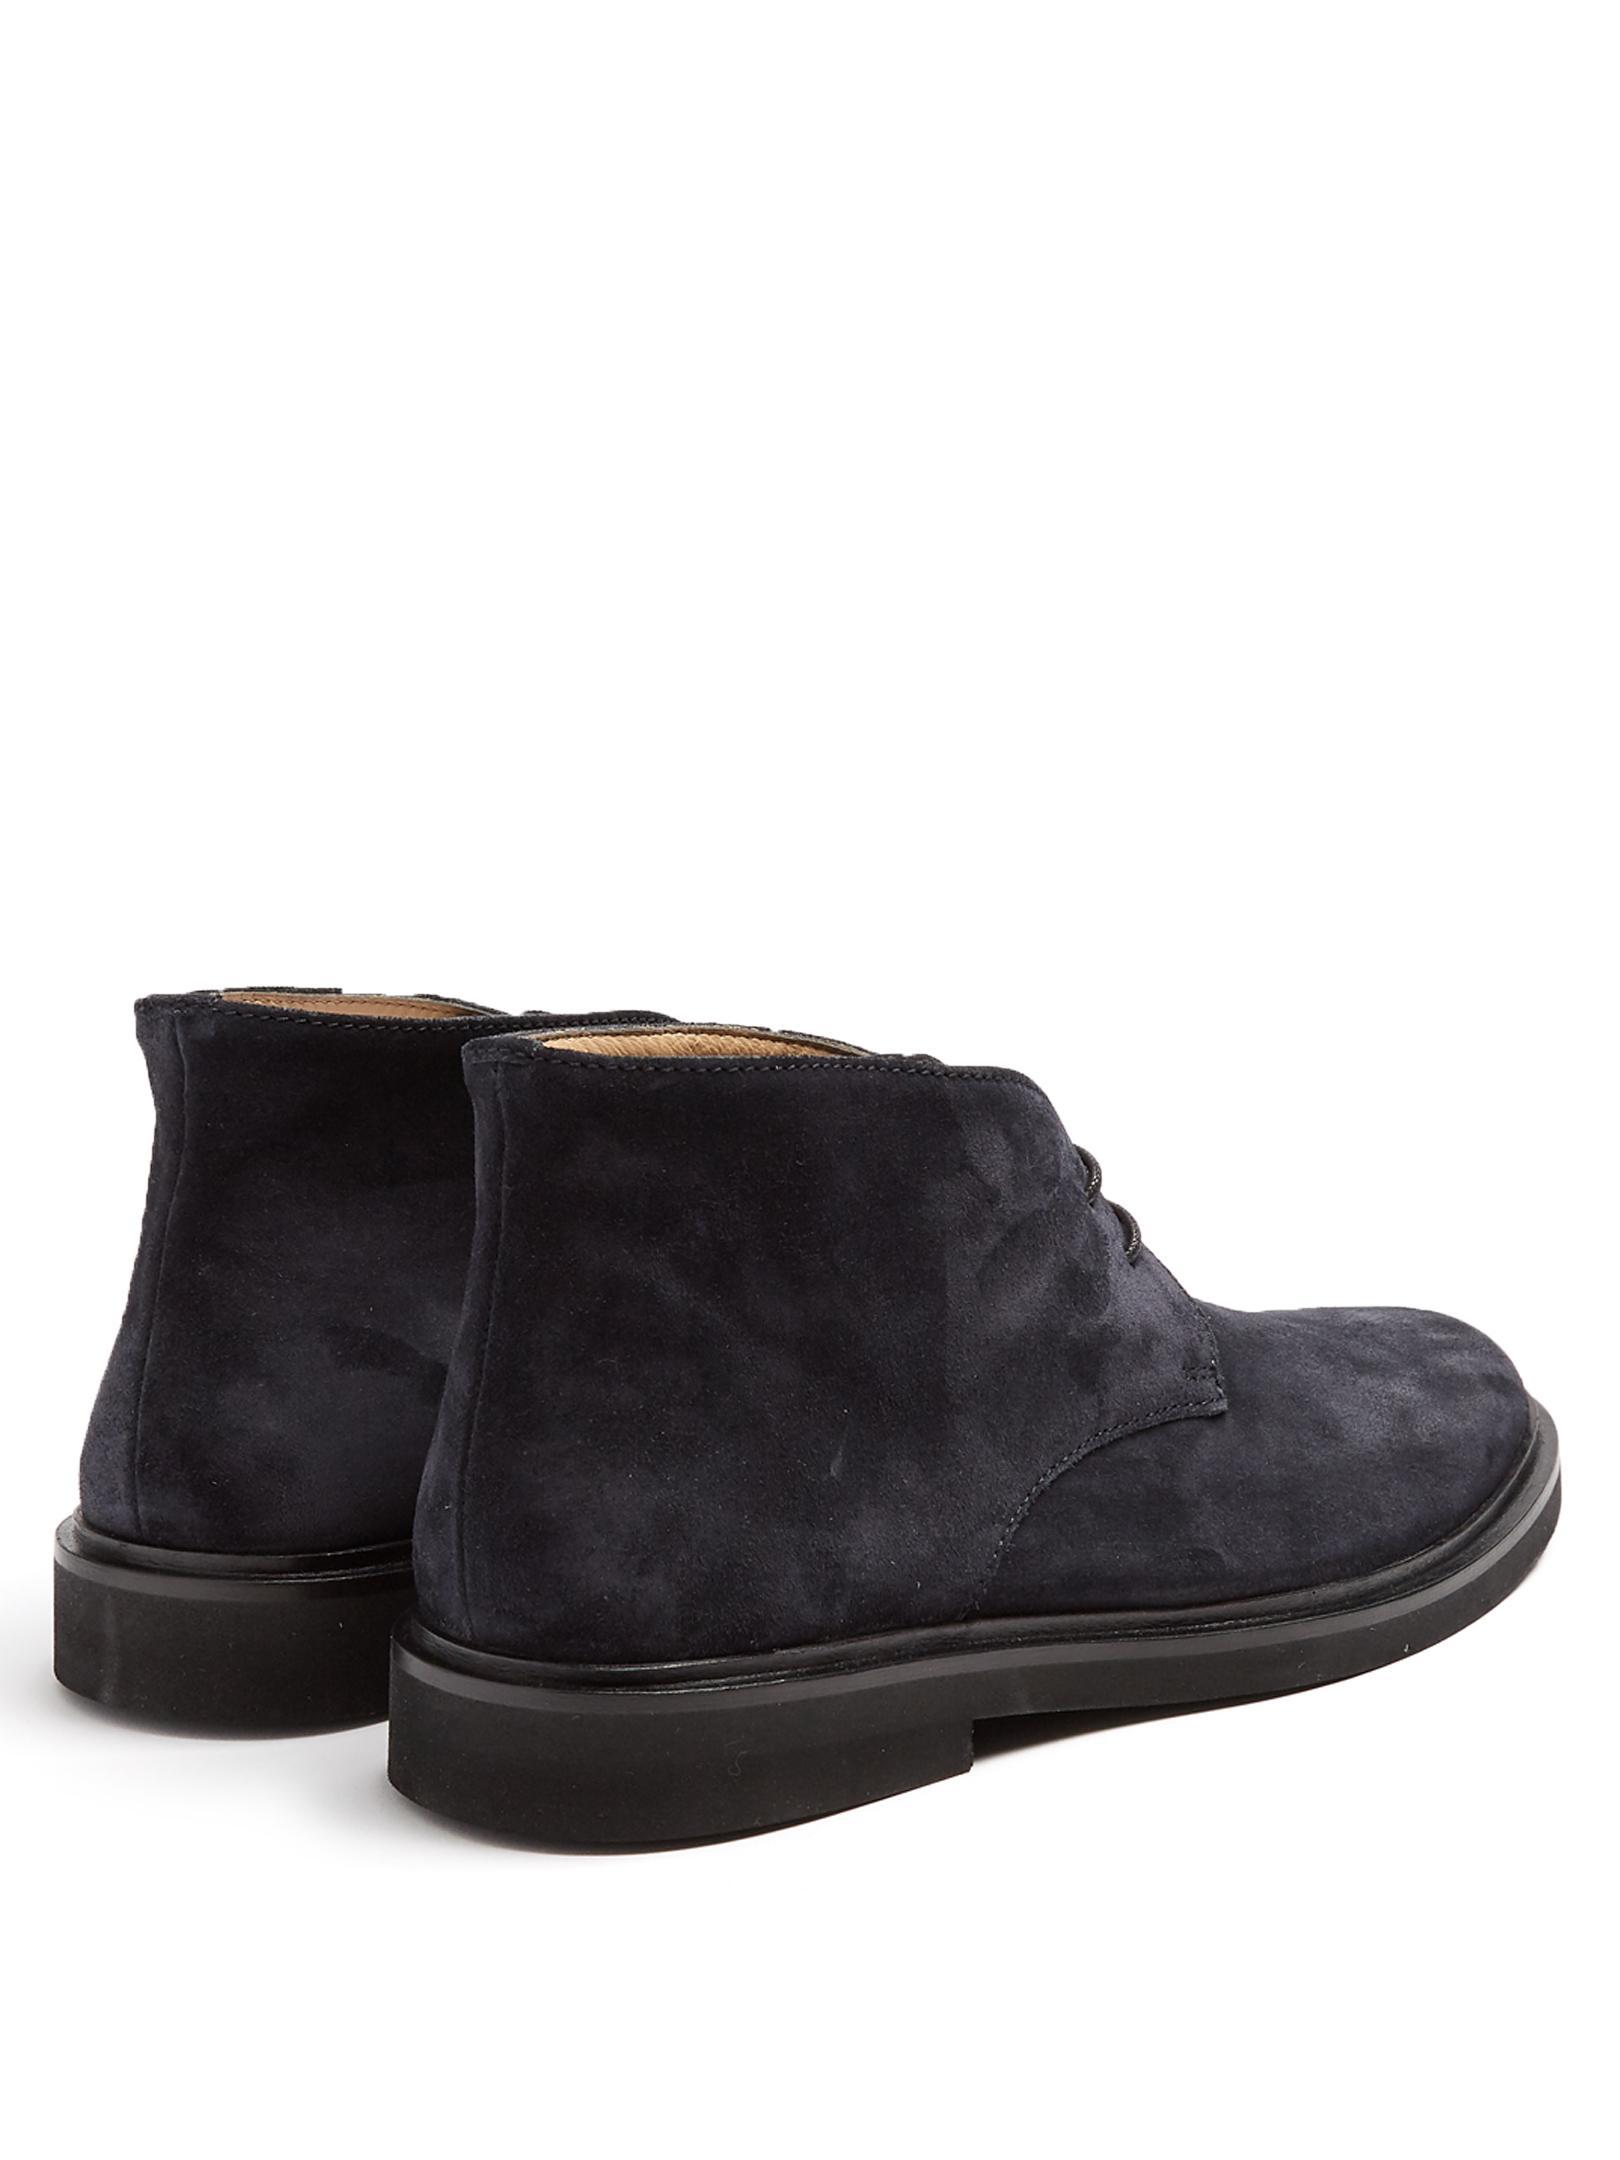 Tan Suede Camarguaises Anna Boots A.P.C. Cheap Sale Fast Delivery Explore QYfAXIV